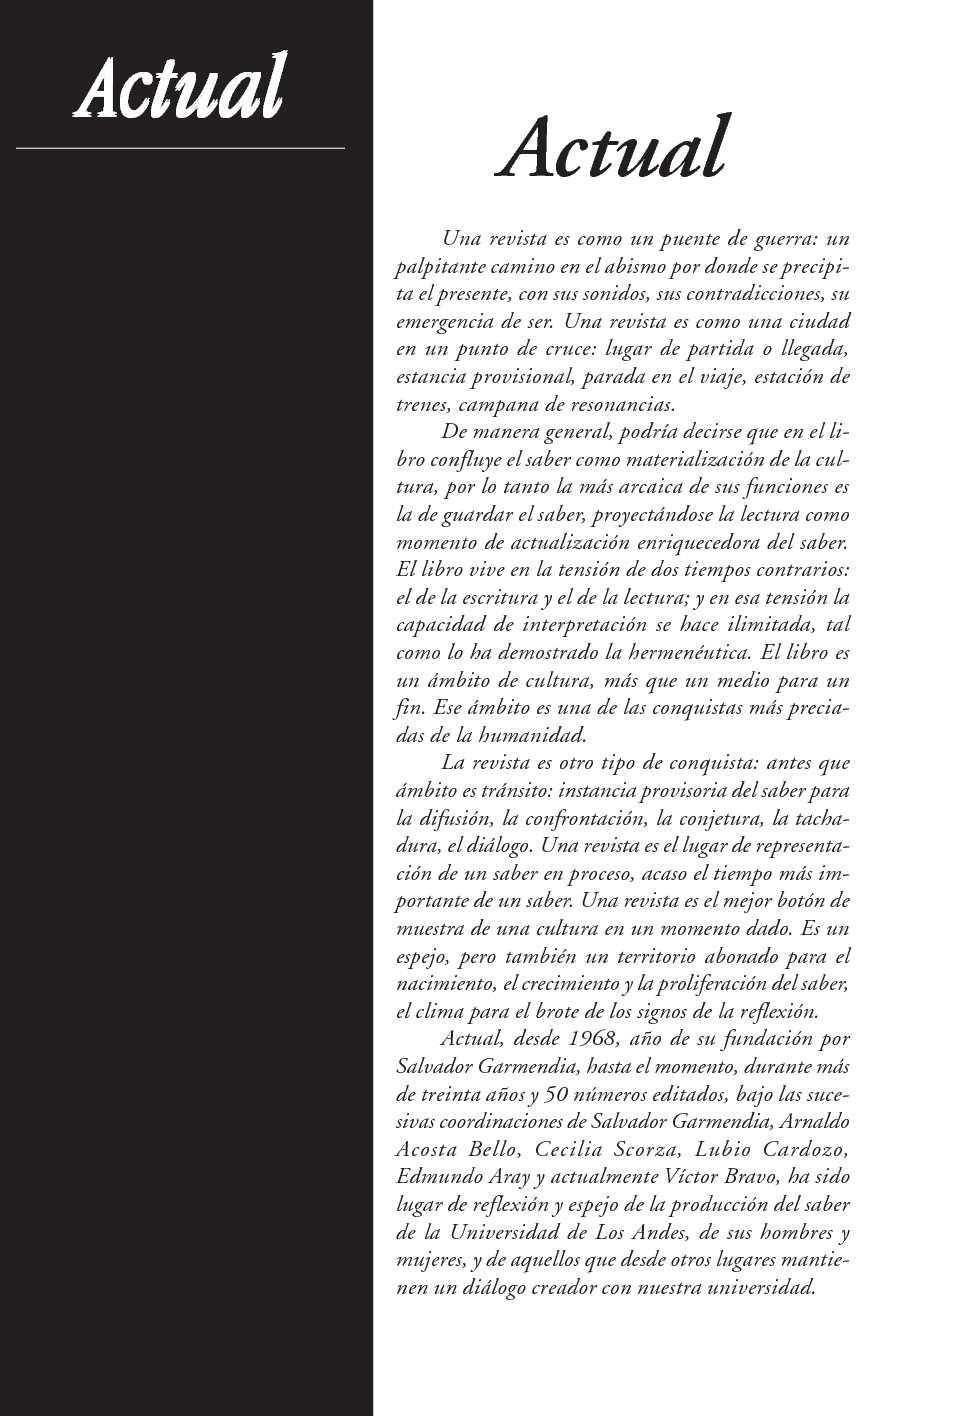 Calaméo - Revista Actual de Venezuela dedicada a Puerto Rico